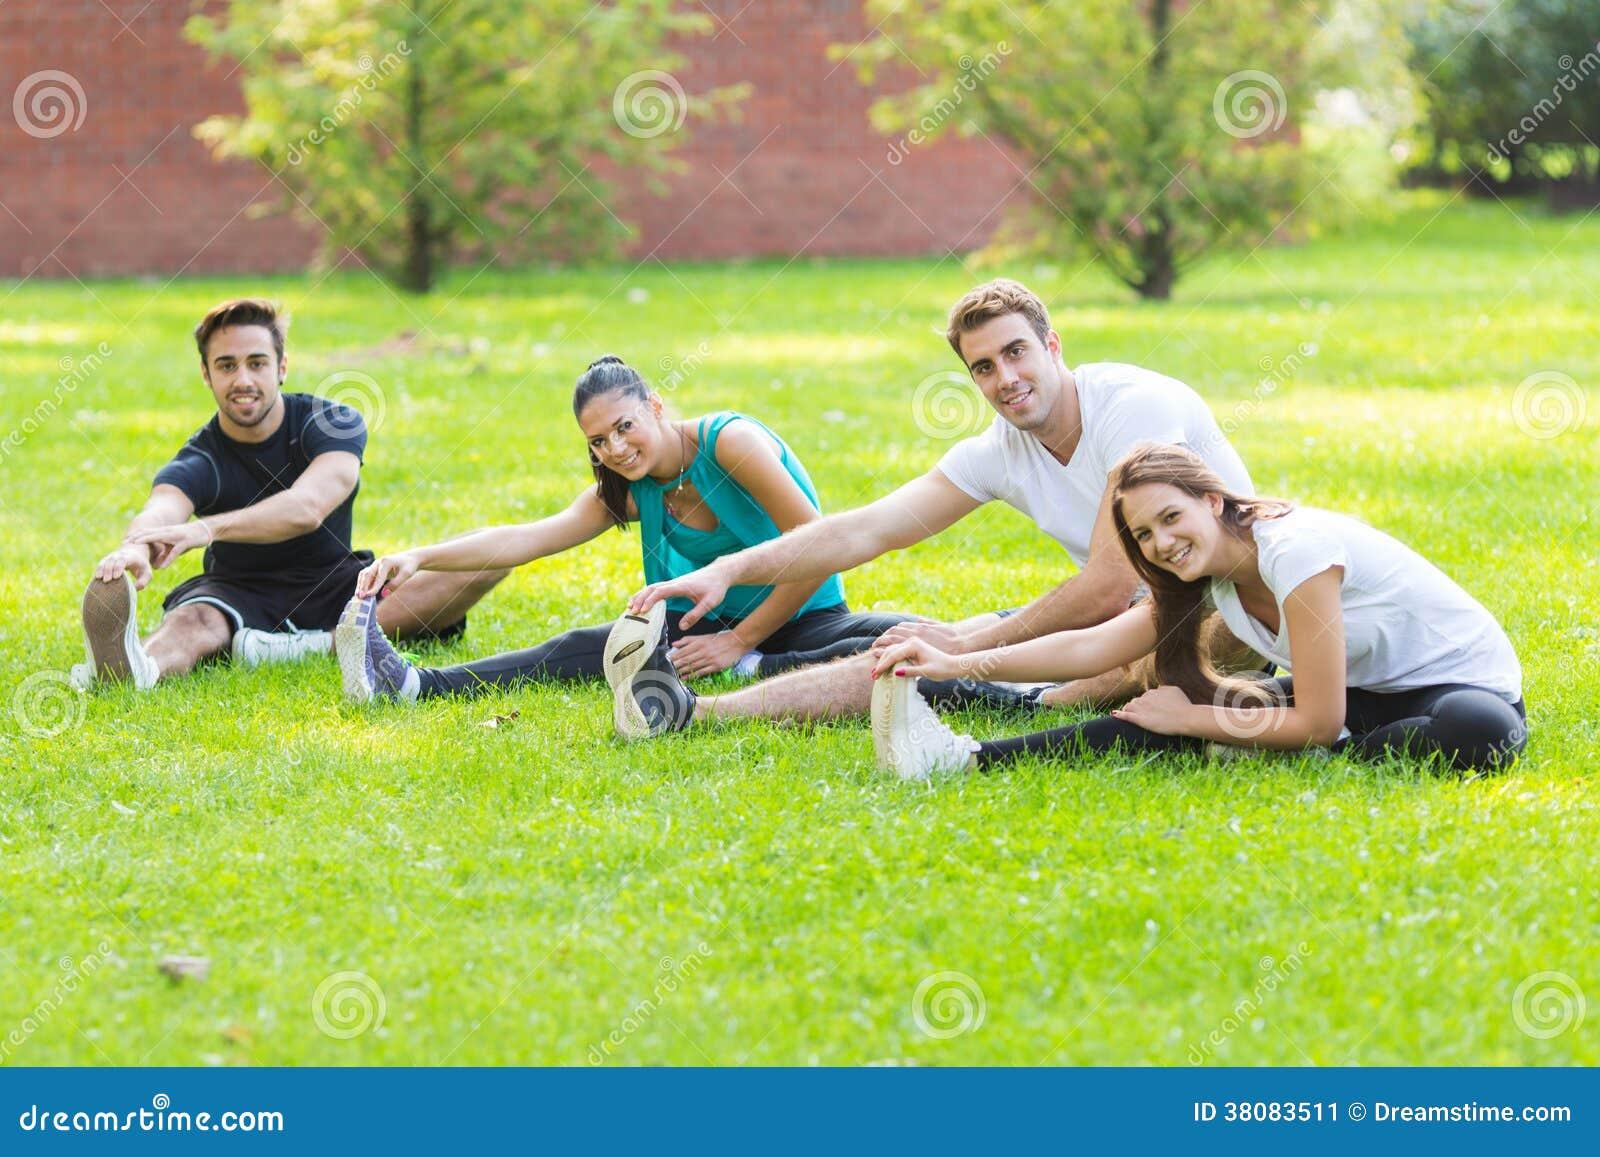 fitness friends stock image image 38083511. Black Bedroom Furniture Sets. Home Design Ideas